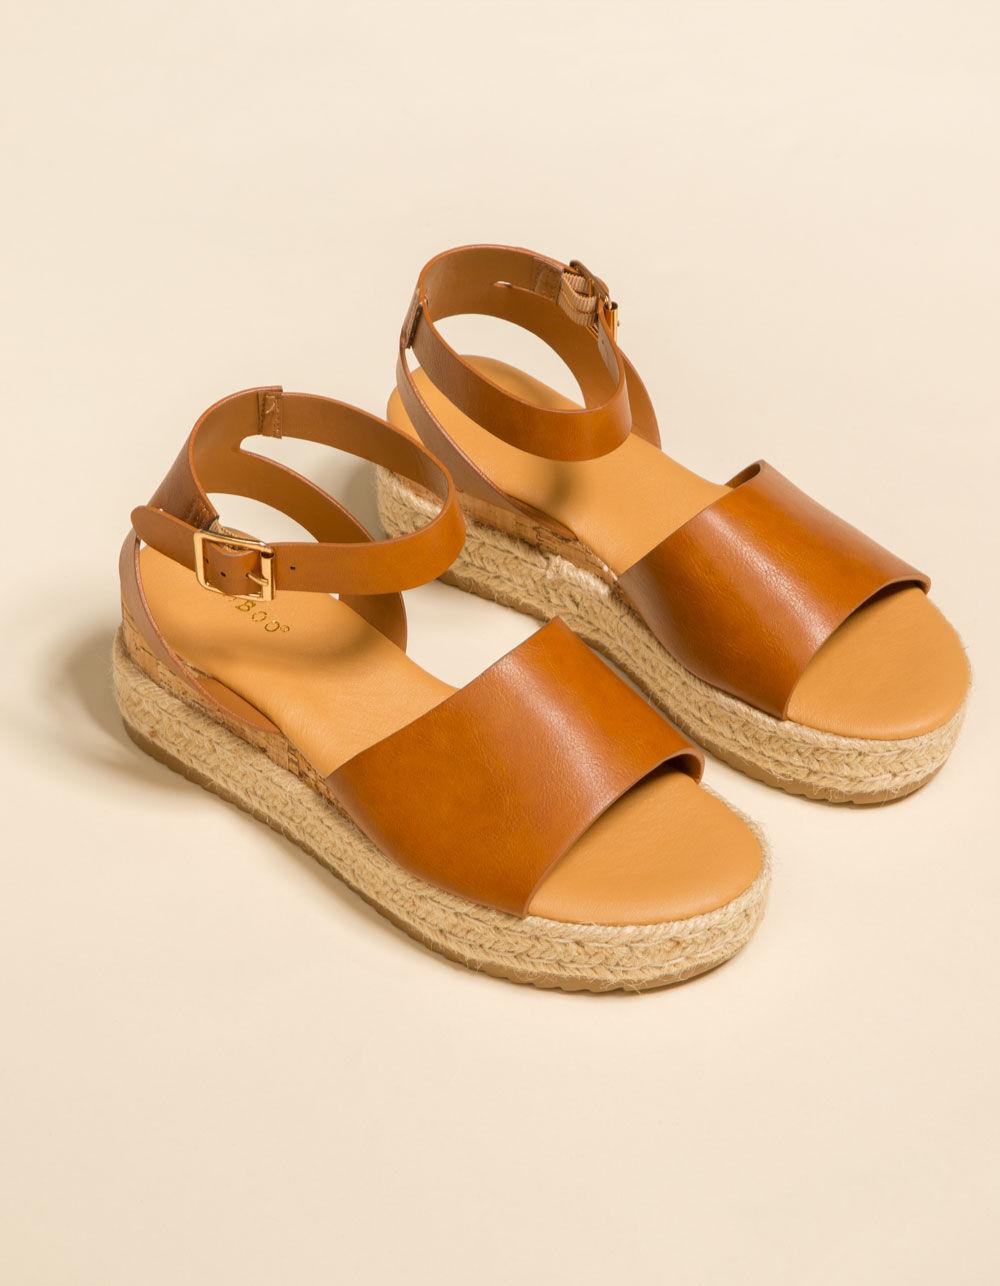 BAMBOO Jute Ankle Wrap Tan Espadrille Flatform Sandals